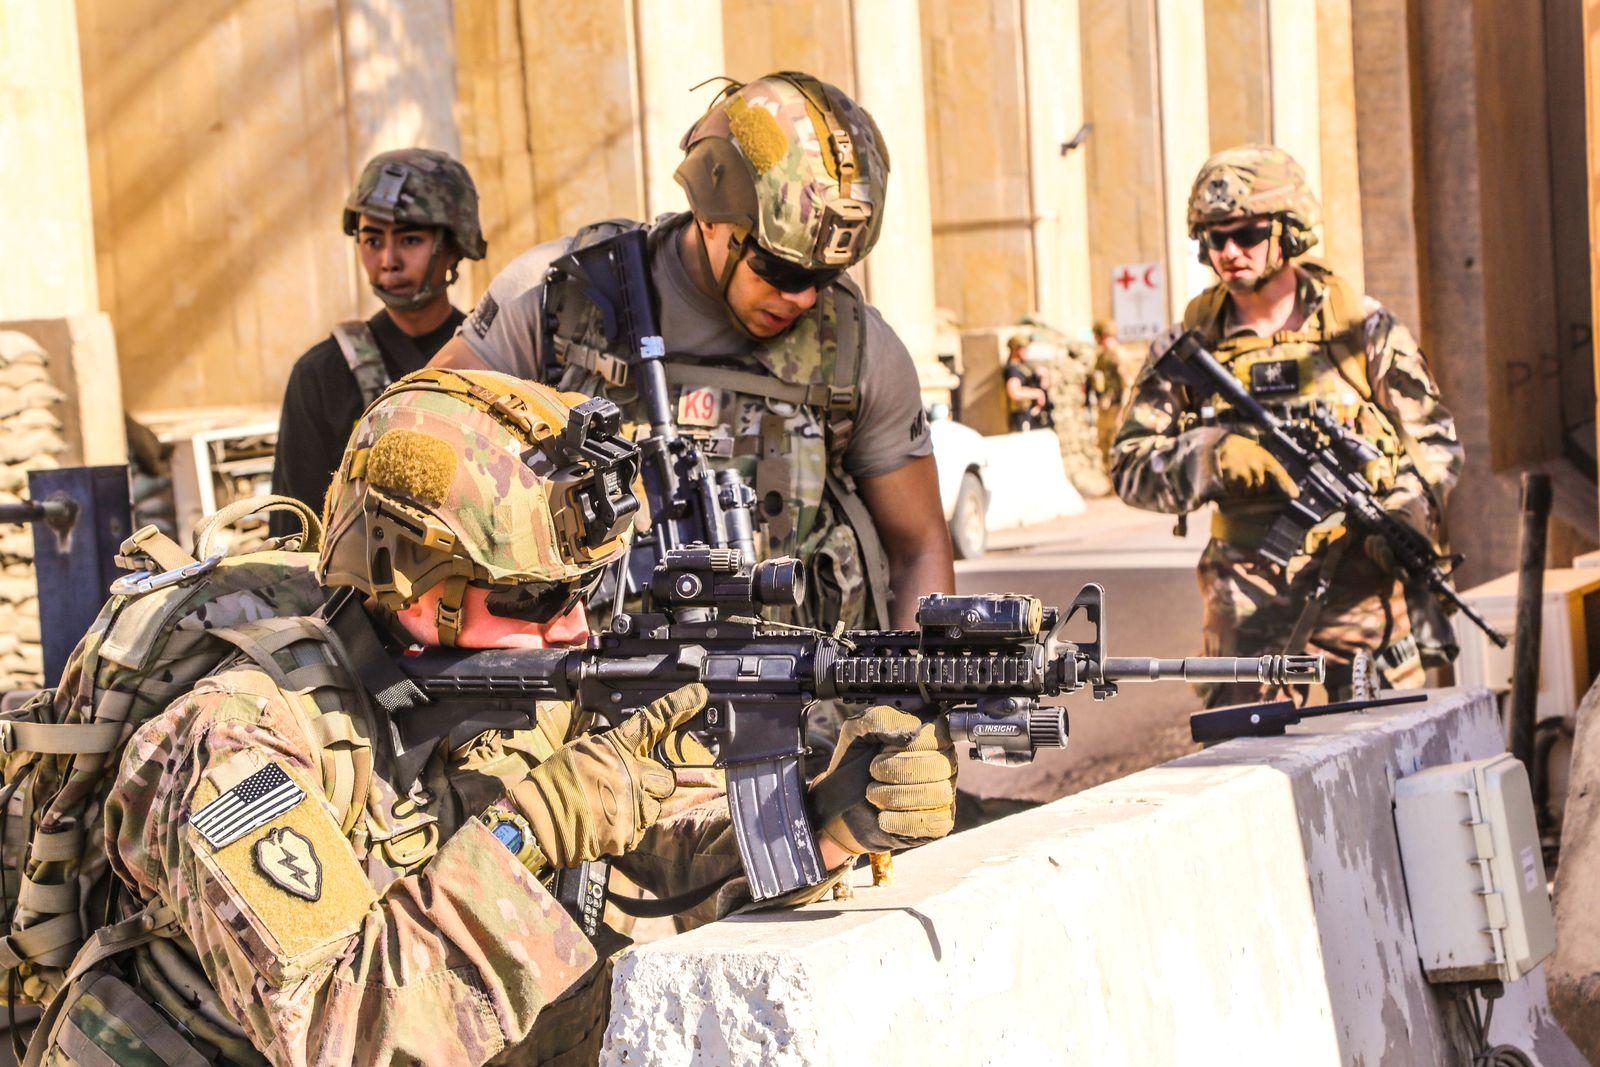 IRAQ-SECURITY/USA